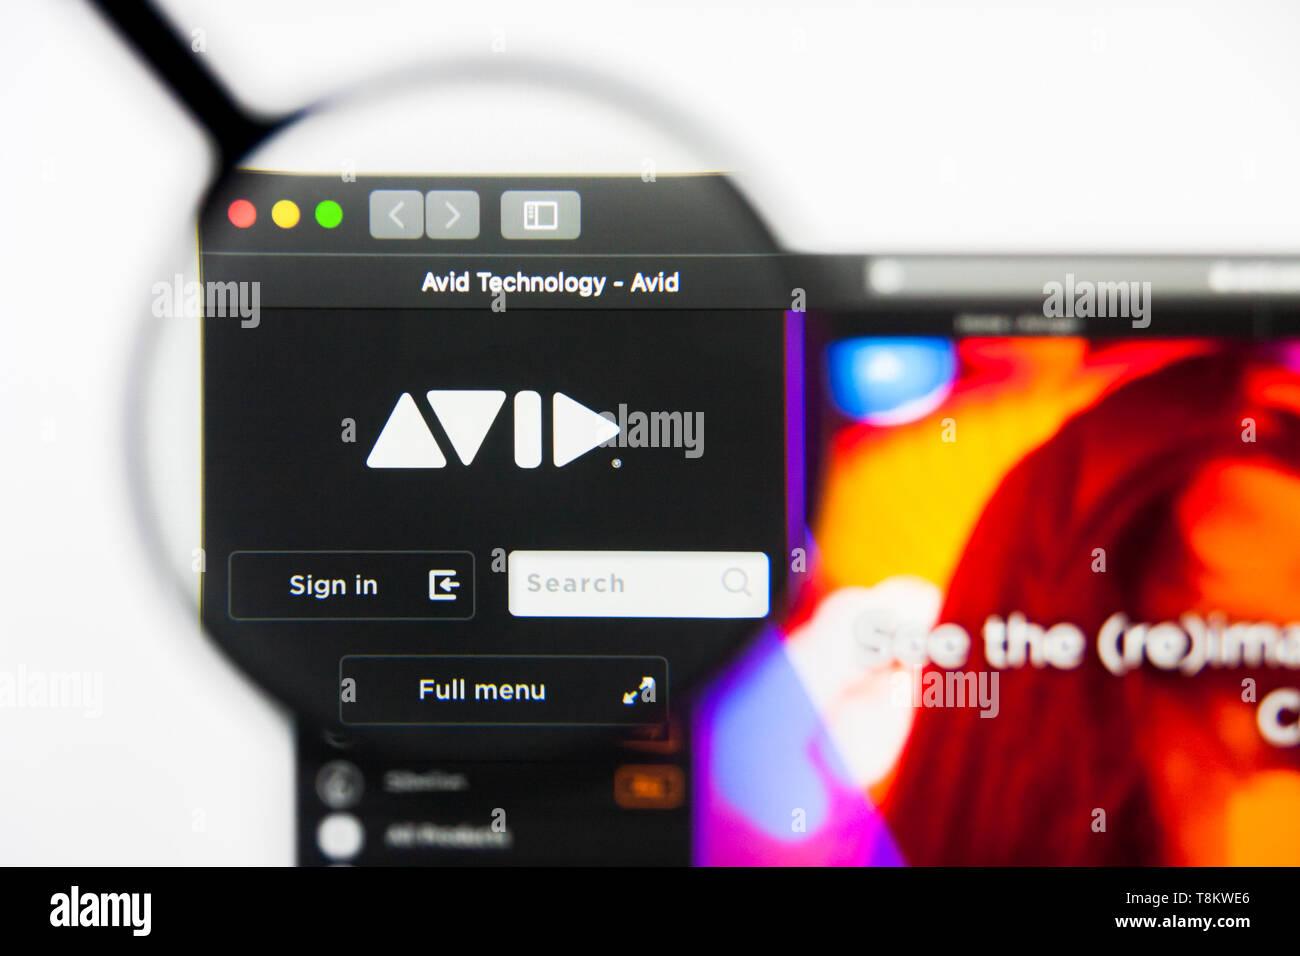 Avid Stock Photos & Avid Stock Images - Alamy